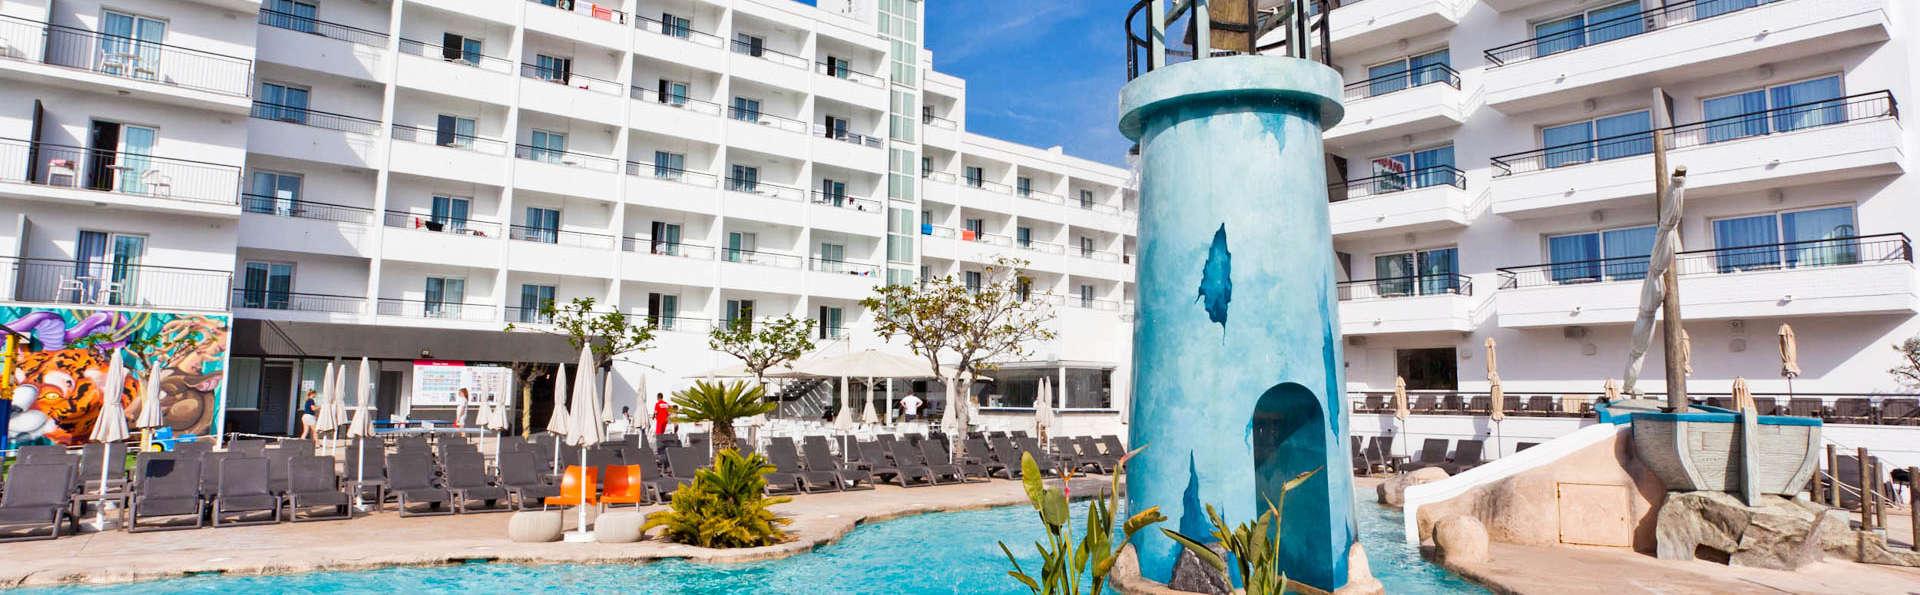 Hotel Pineda Splash - EDIT_EXTERIOR2.jpg